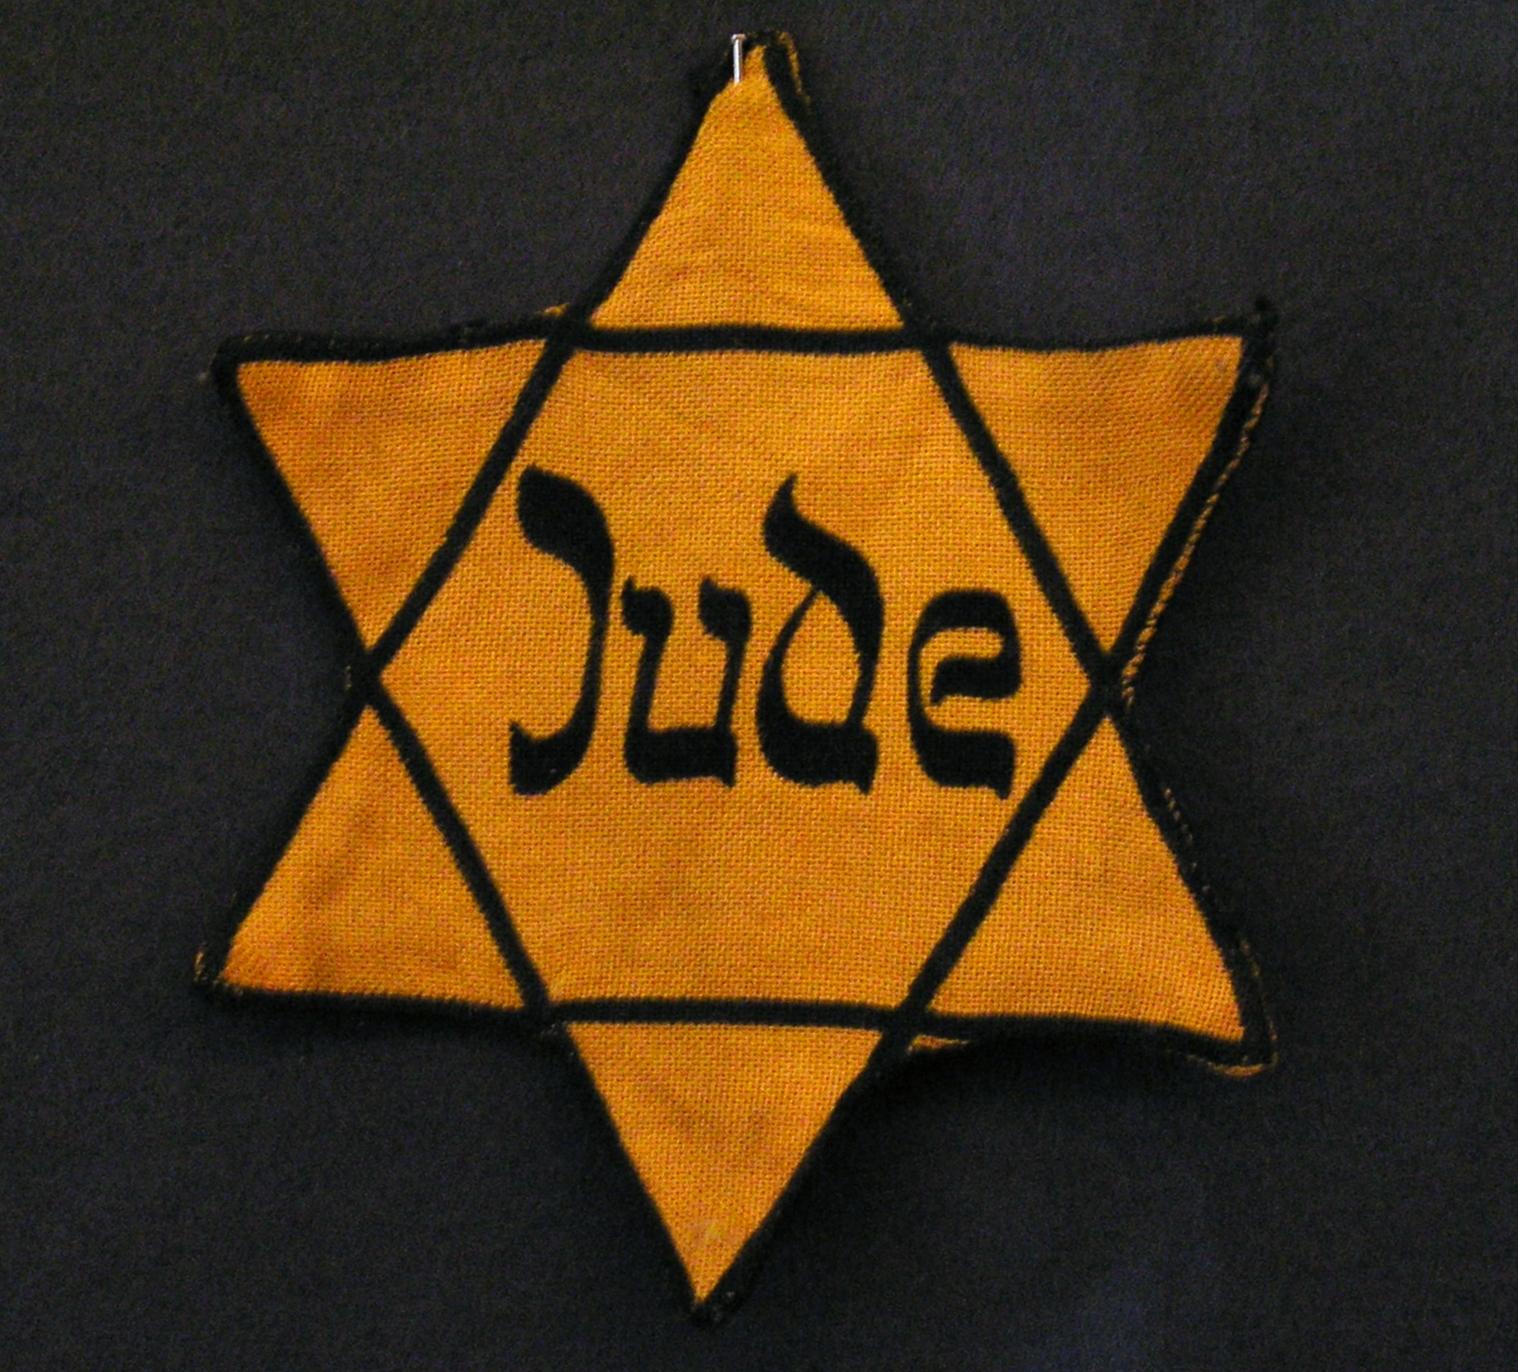 Judenstern_JMW.jpg